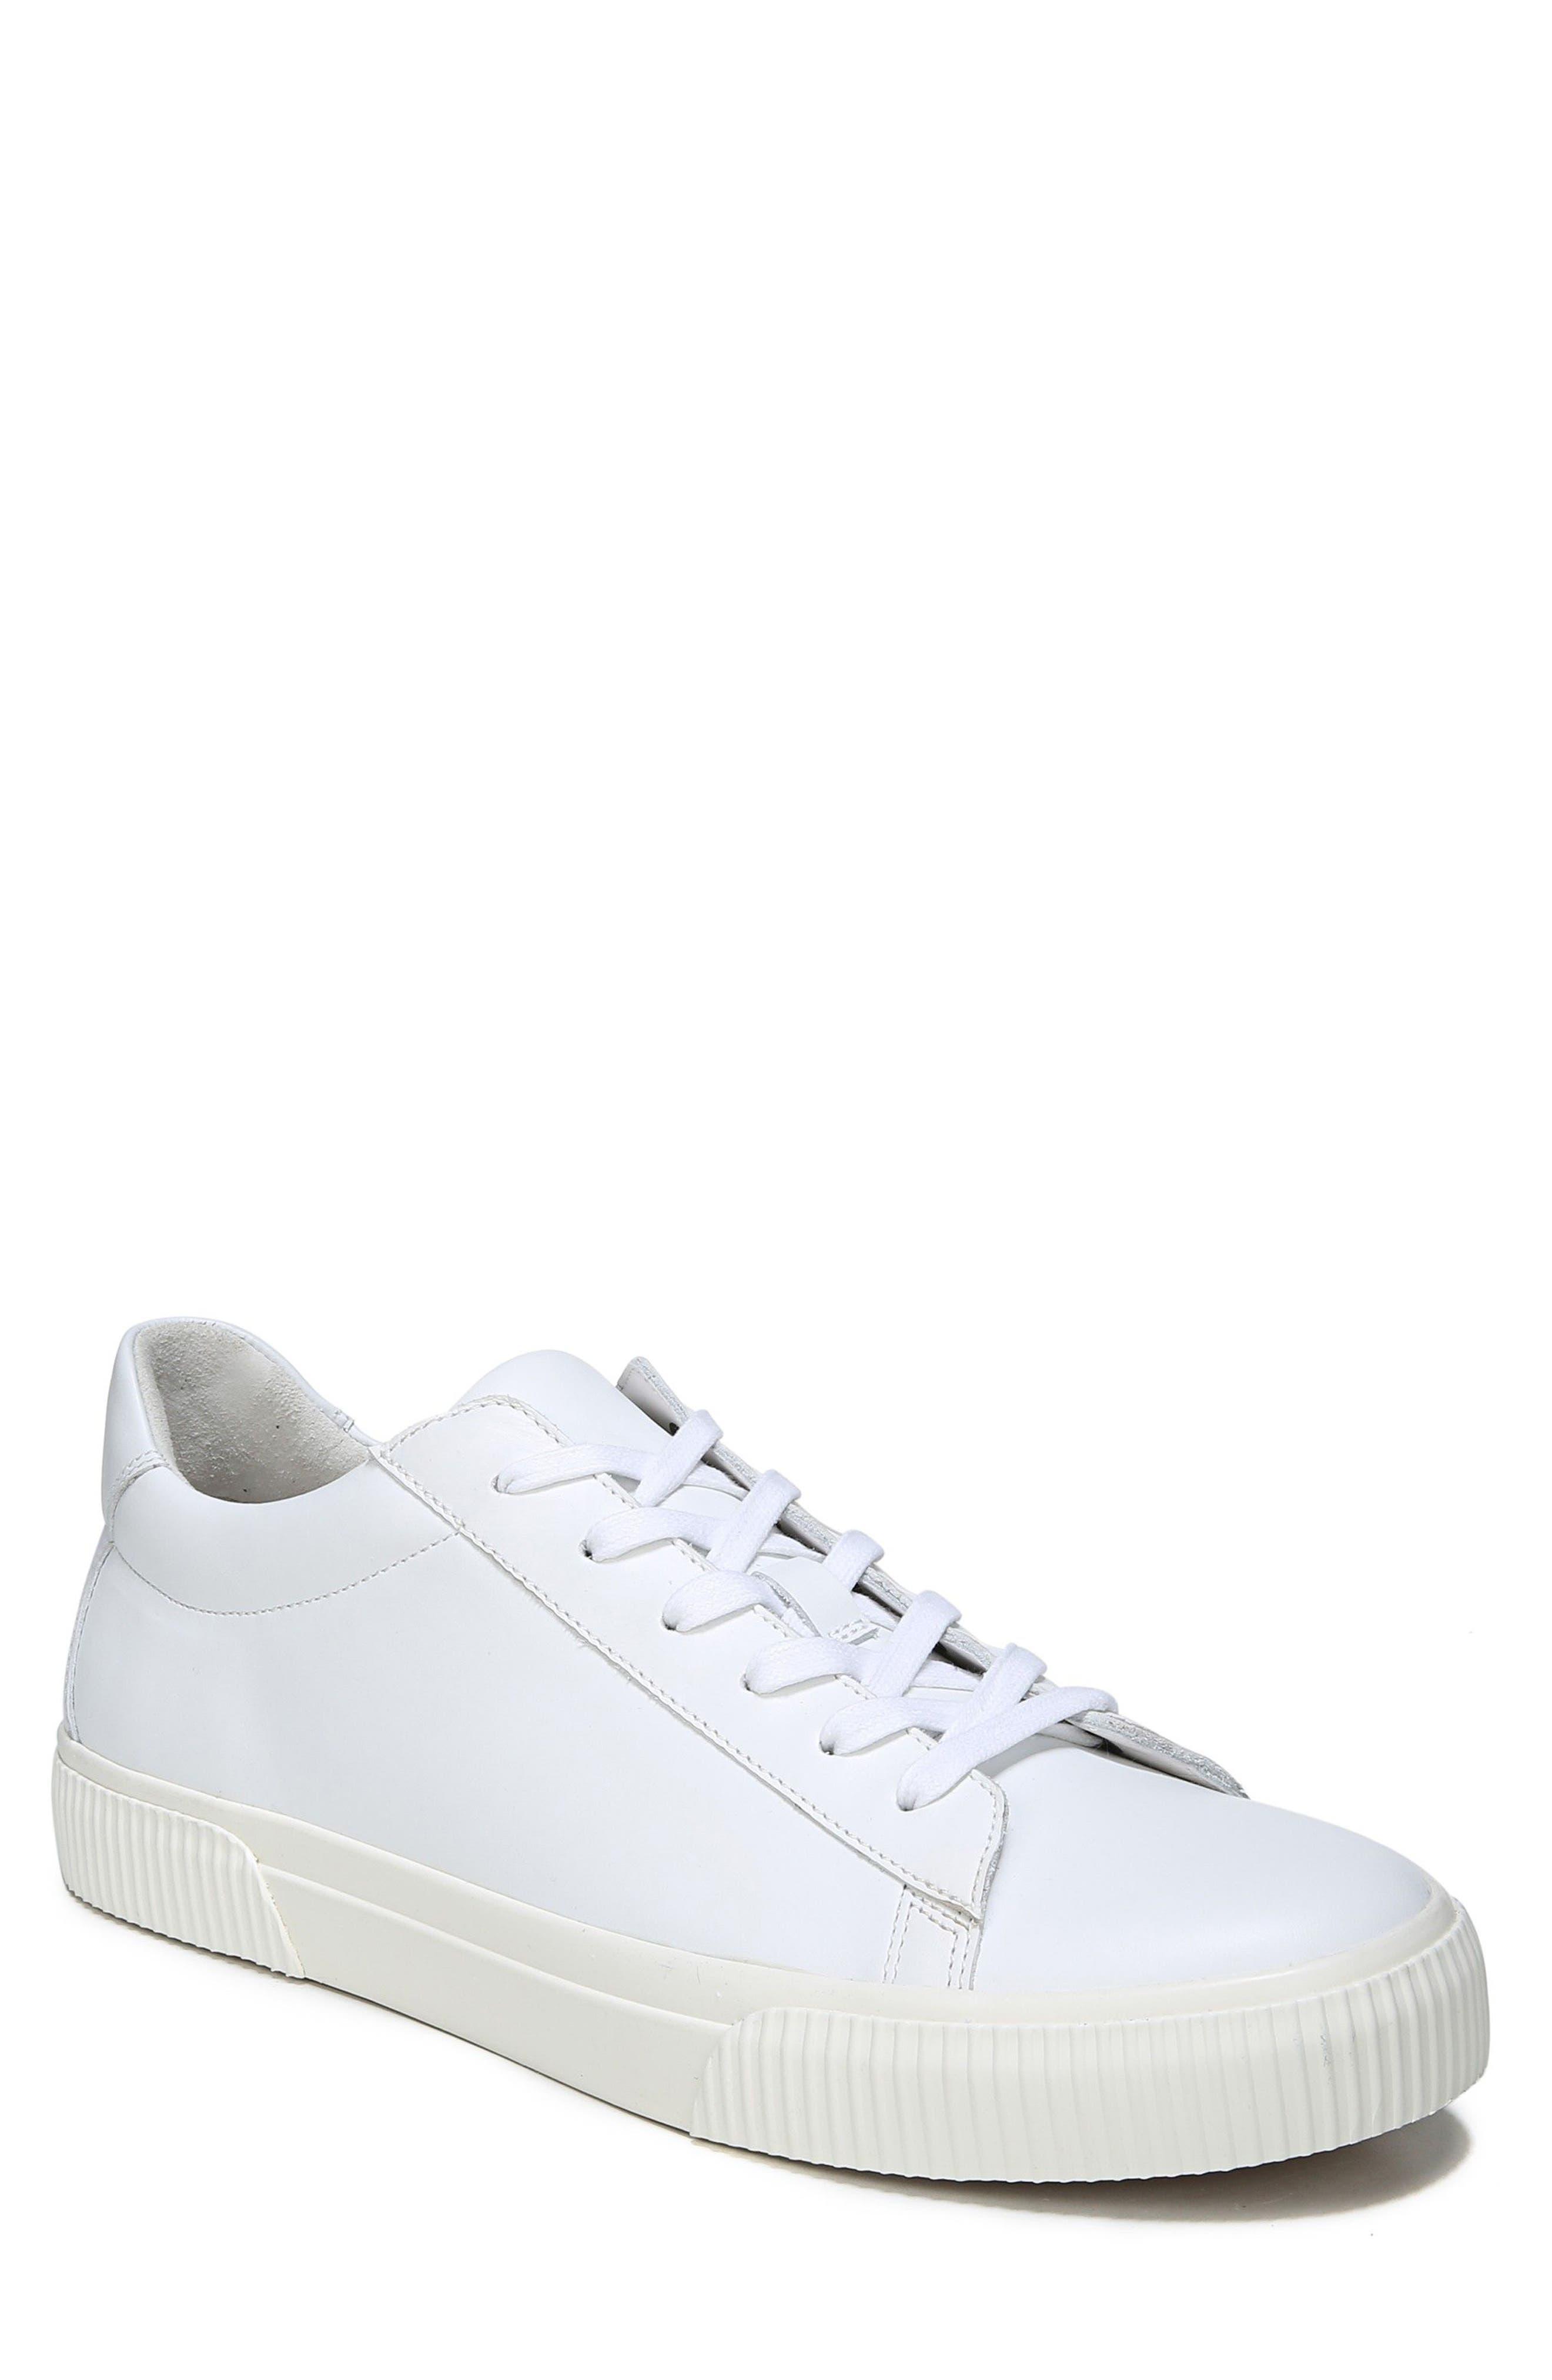 Kurtis Low Top Sneaker,                         Main,                         color, White